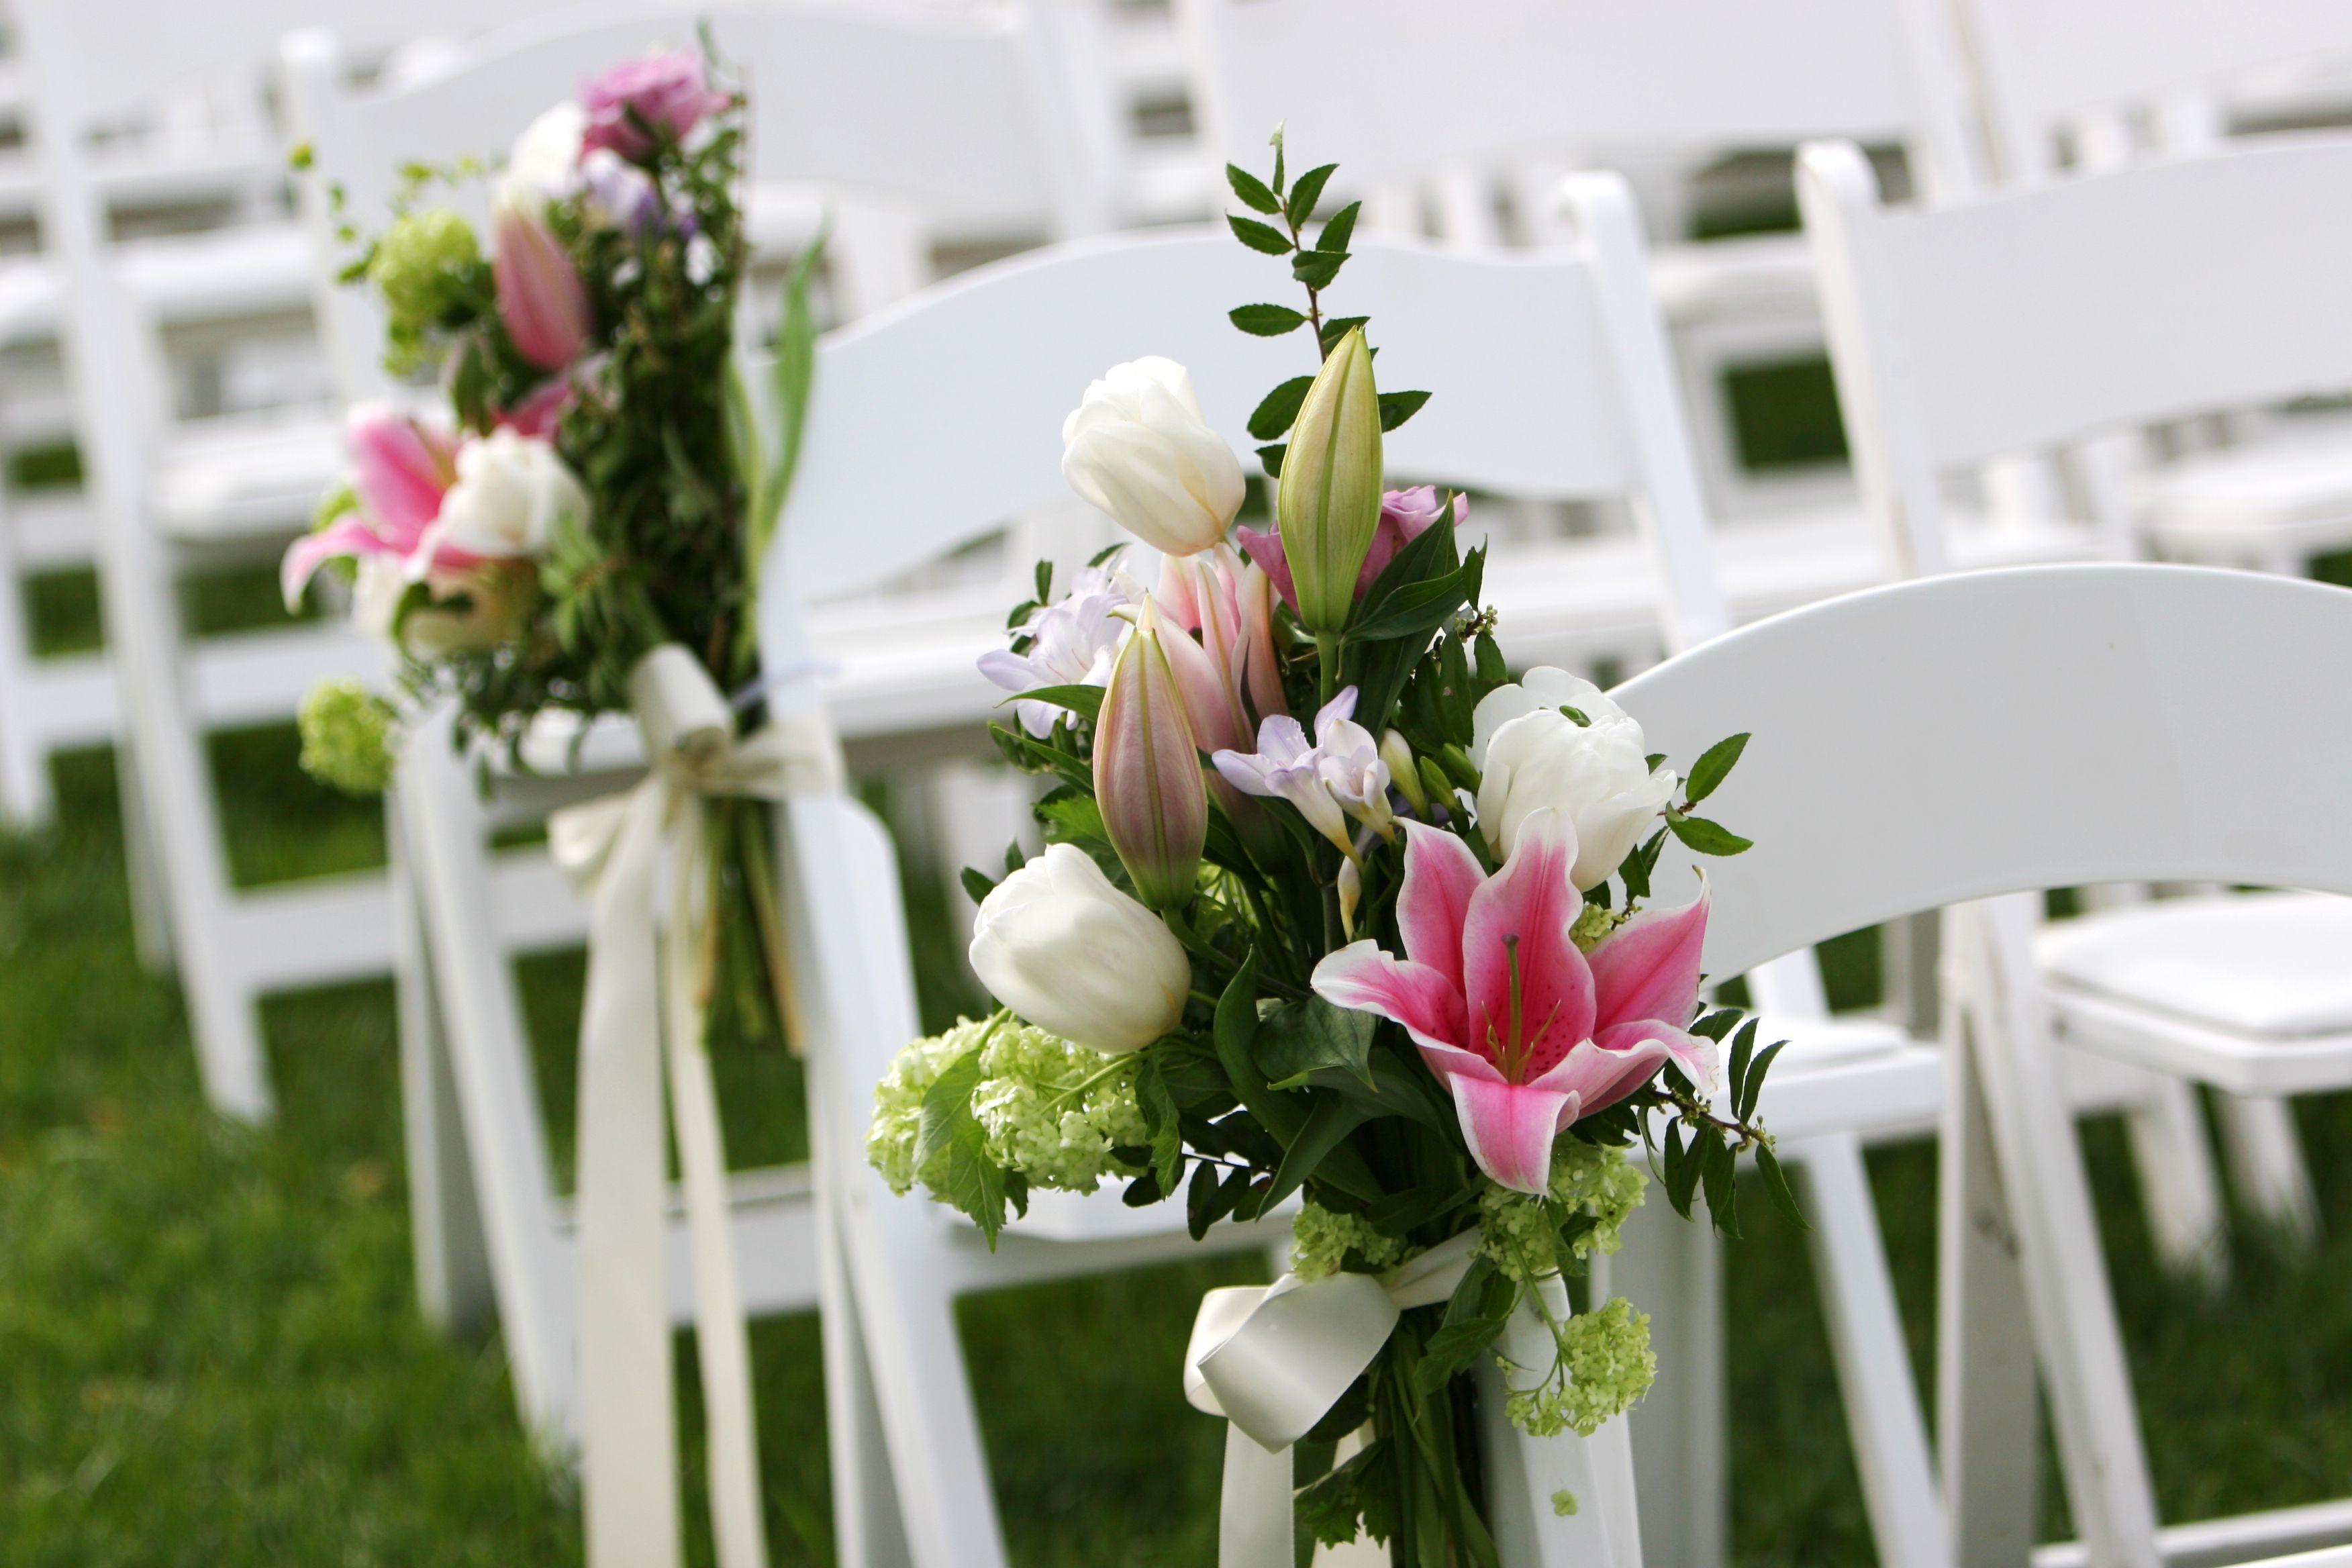 Outdoor Wedding Flower Ideas For A Beach Wedding